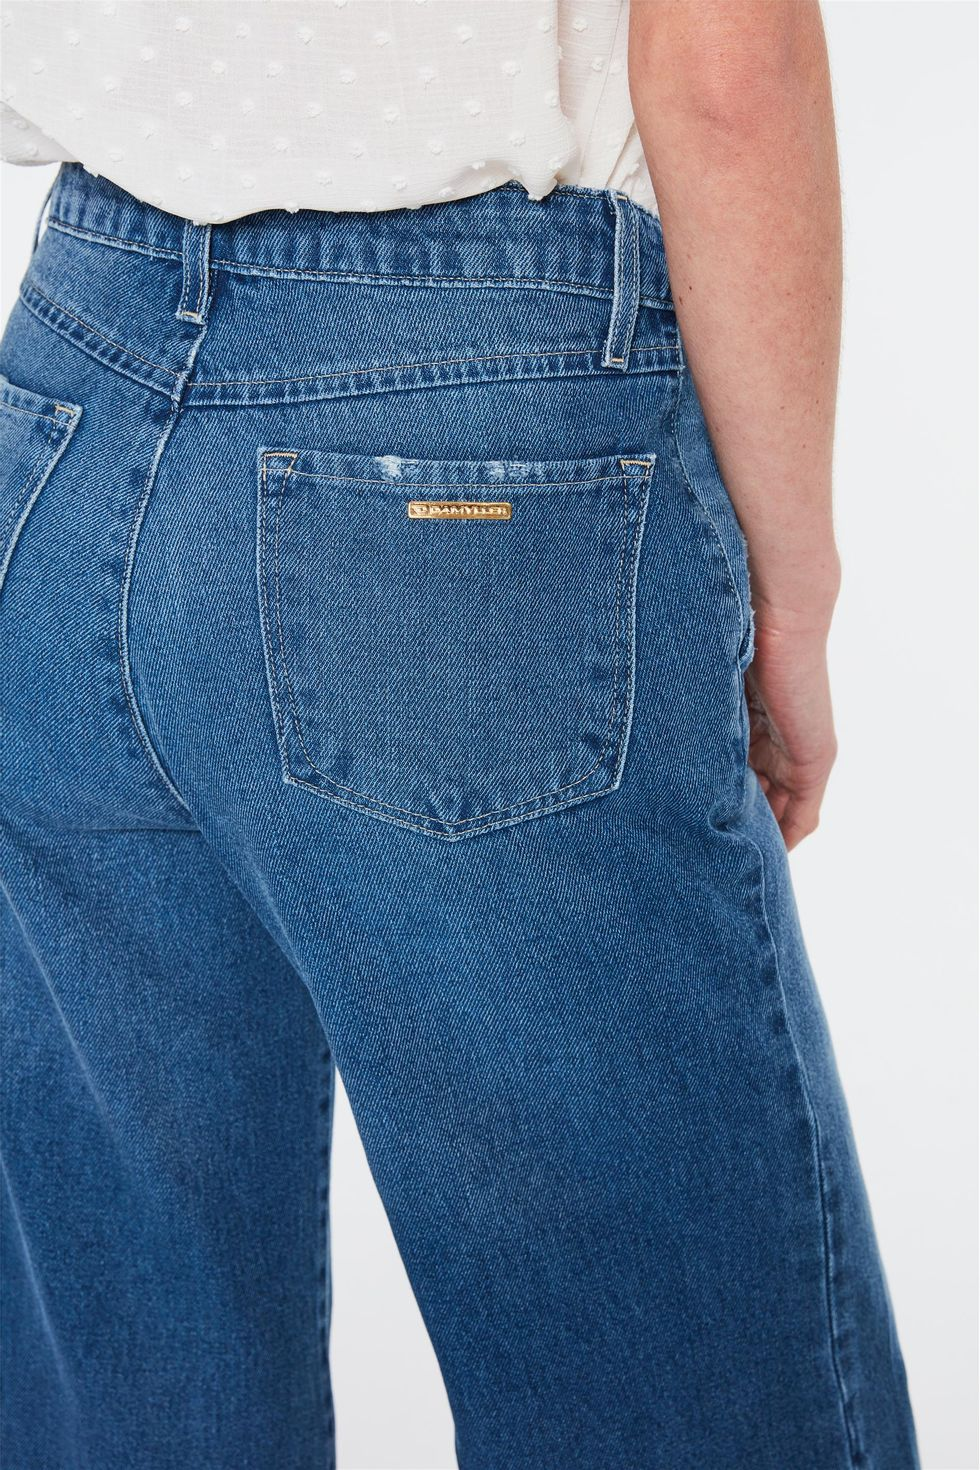 Calca-Jeans-Escura-Pantalona-Cropped-Frente--